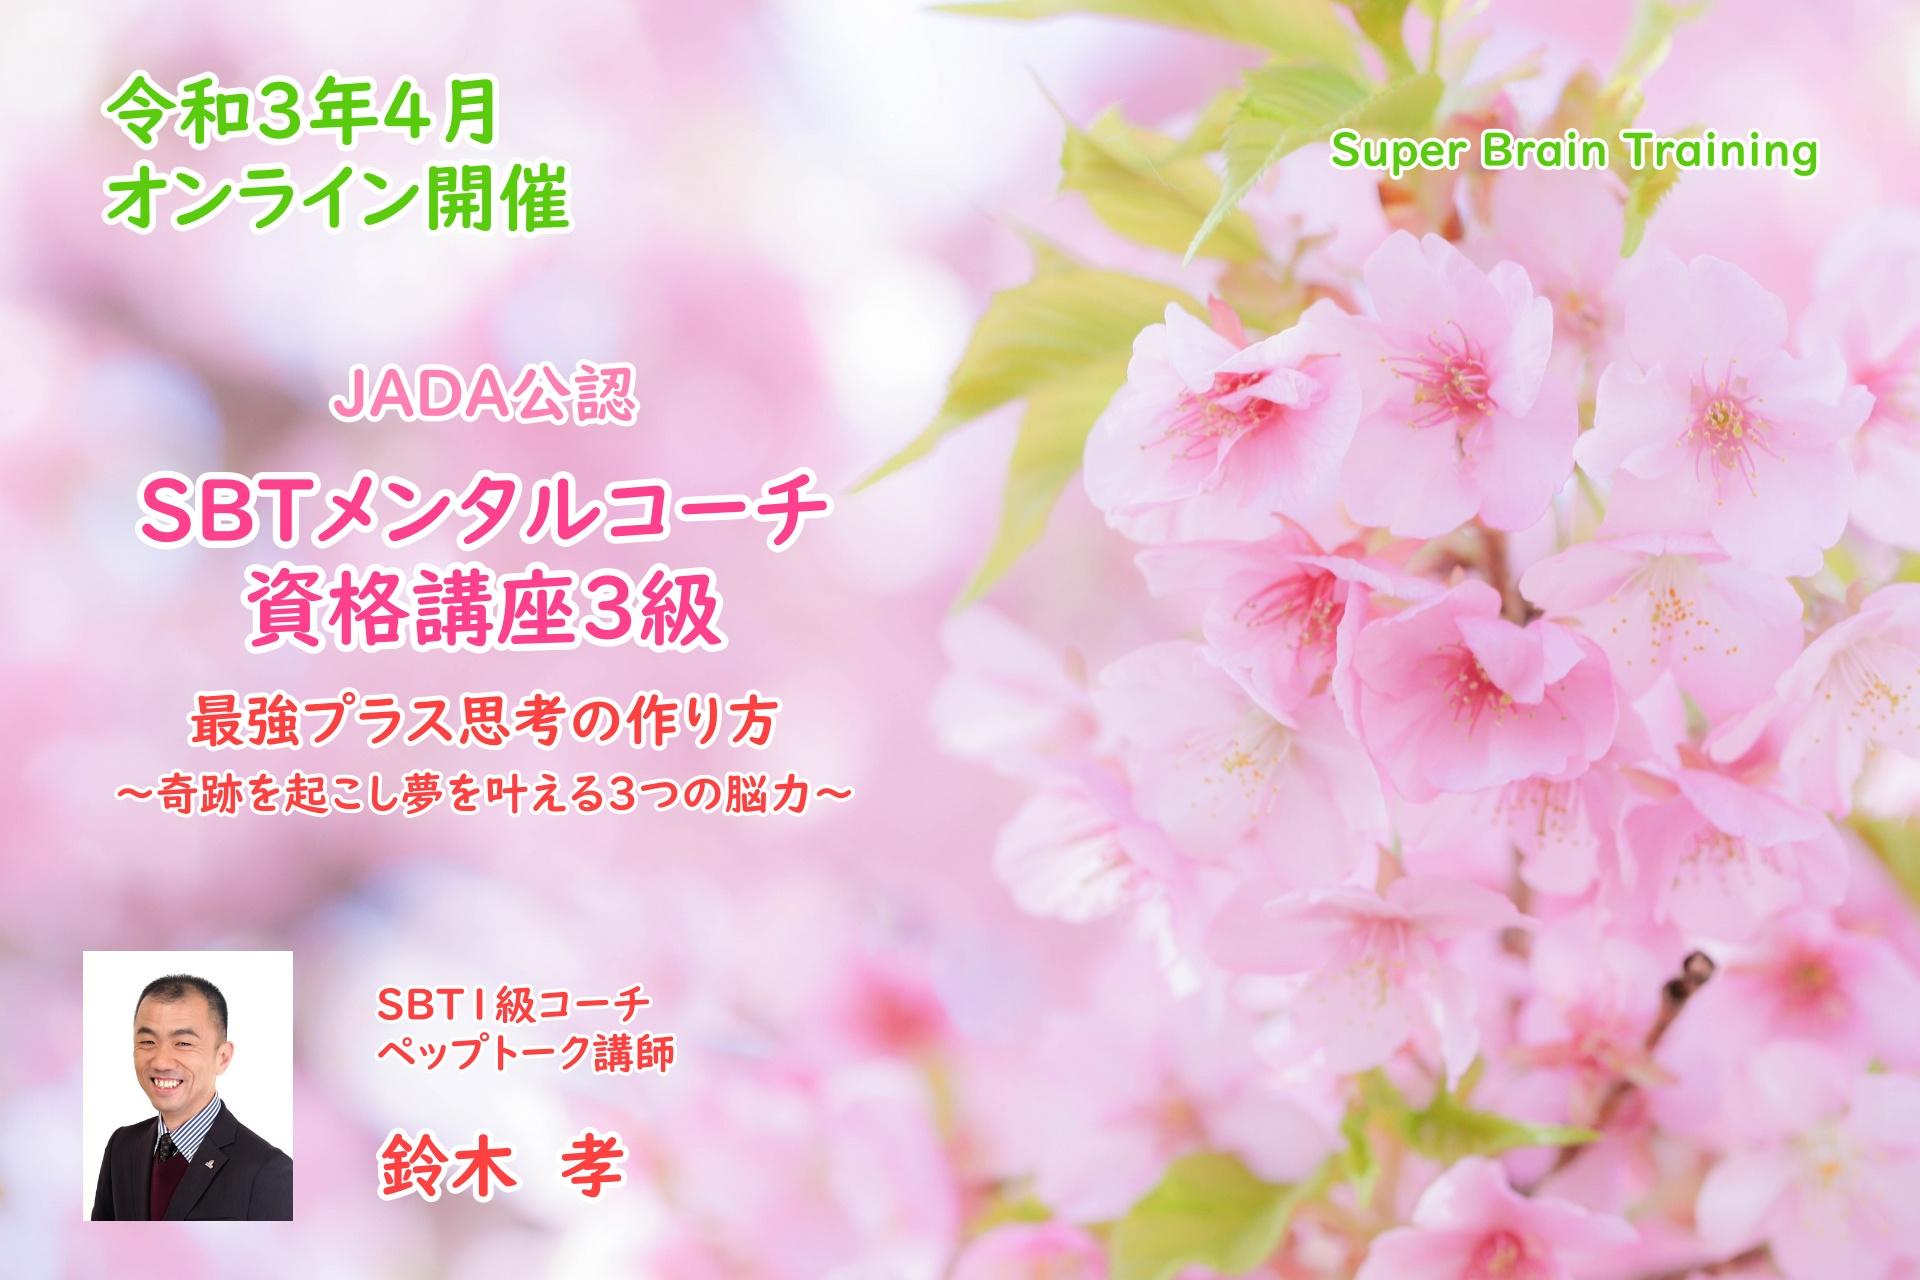 JADA公認SBTメンタルコーチ資格講座3級(名古屋発オンラインZoom開催)